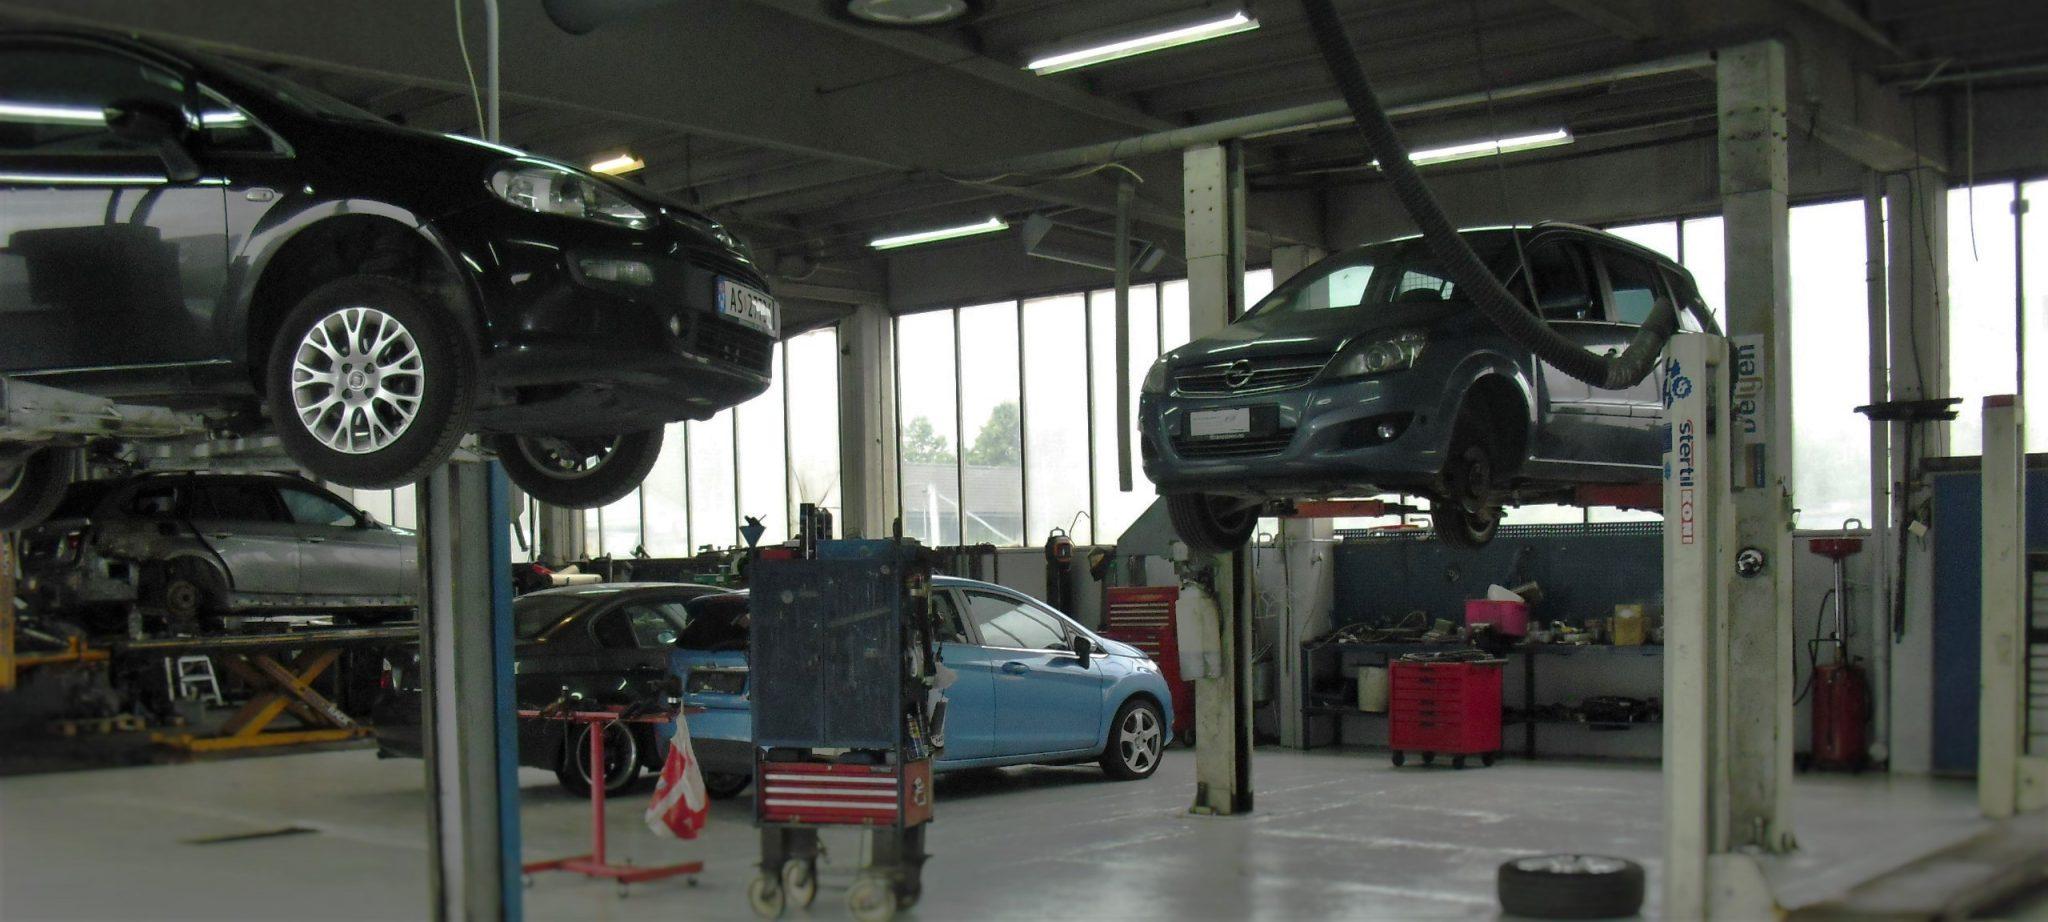 Kontakt oss i Sarpsborg Autoservice - Ditt lokale Bilxtra verksted